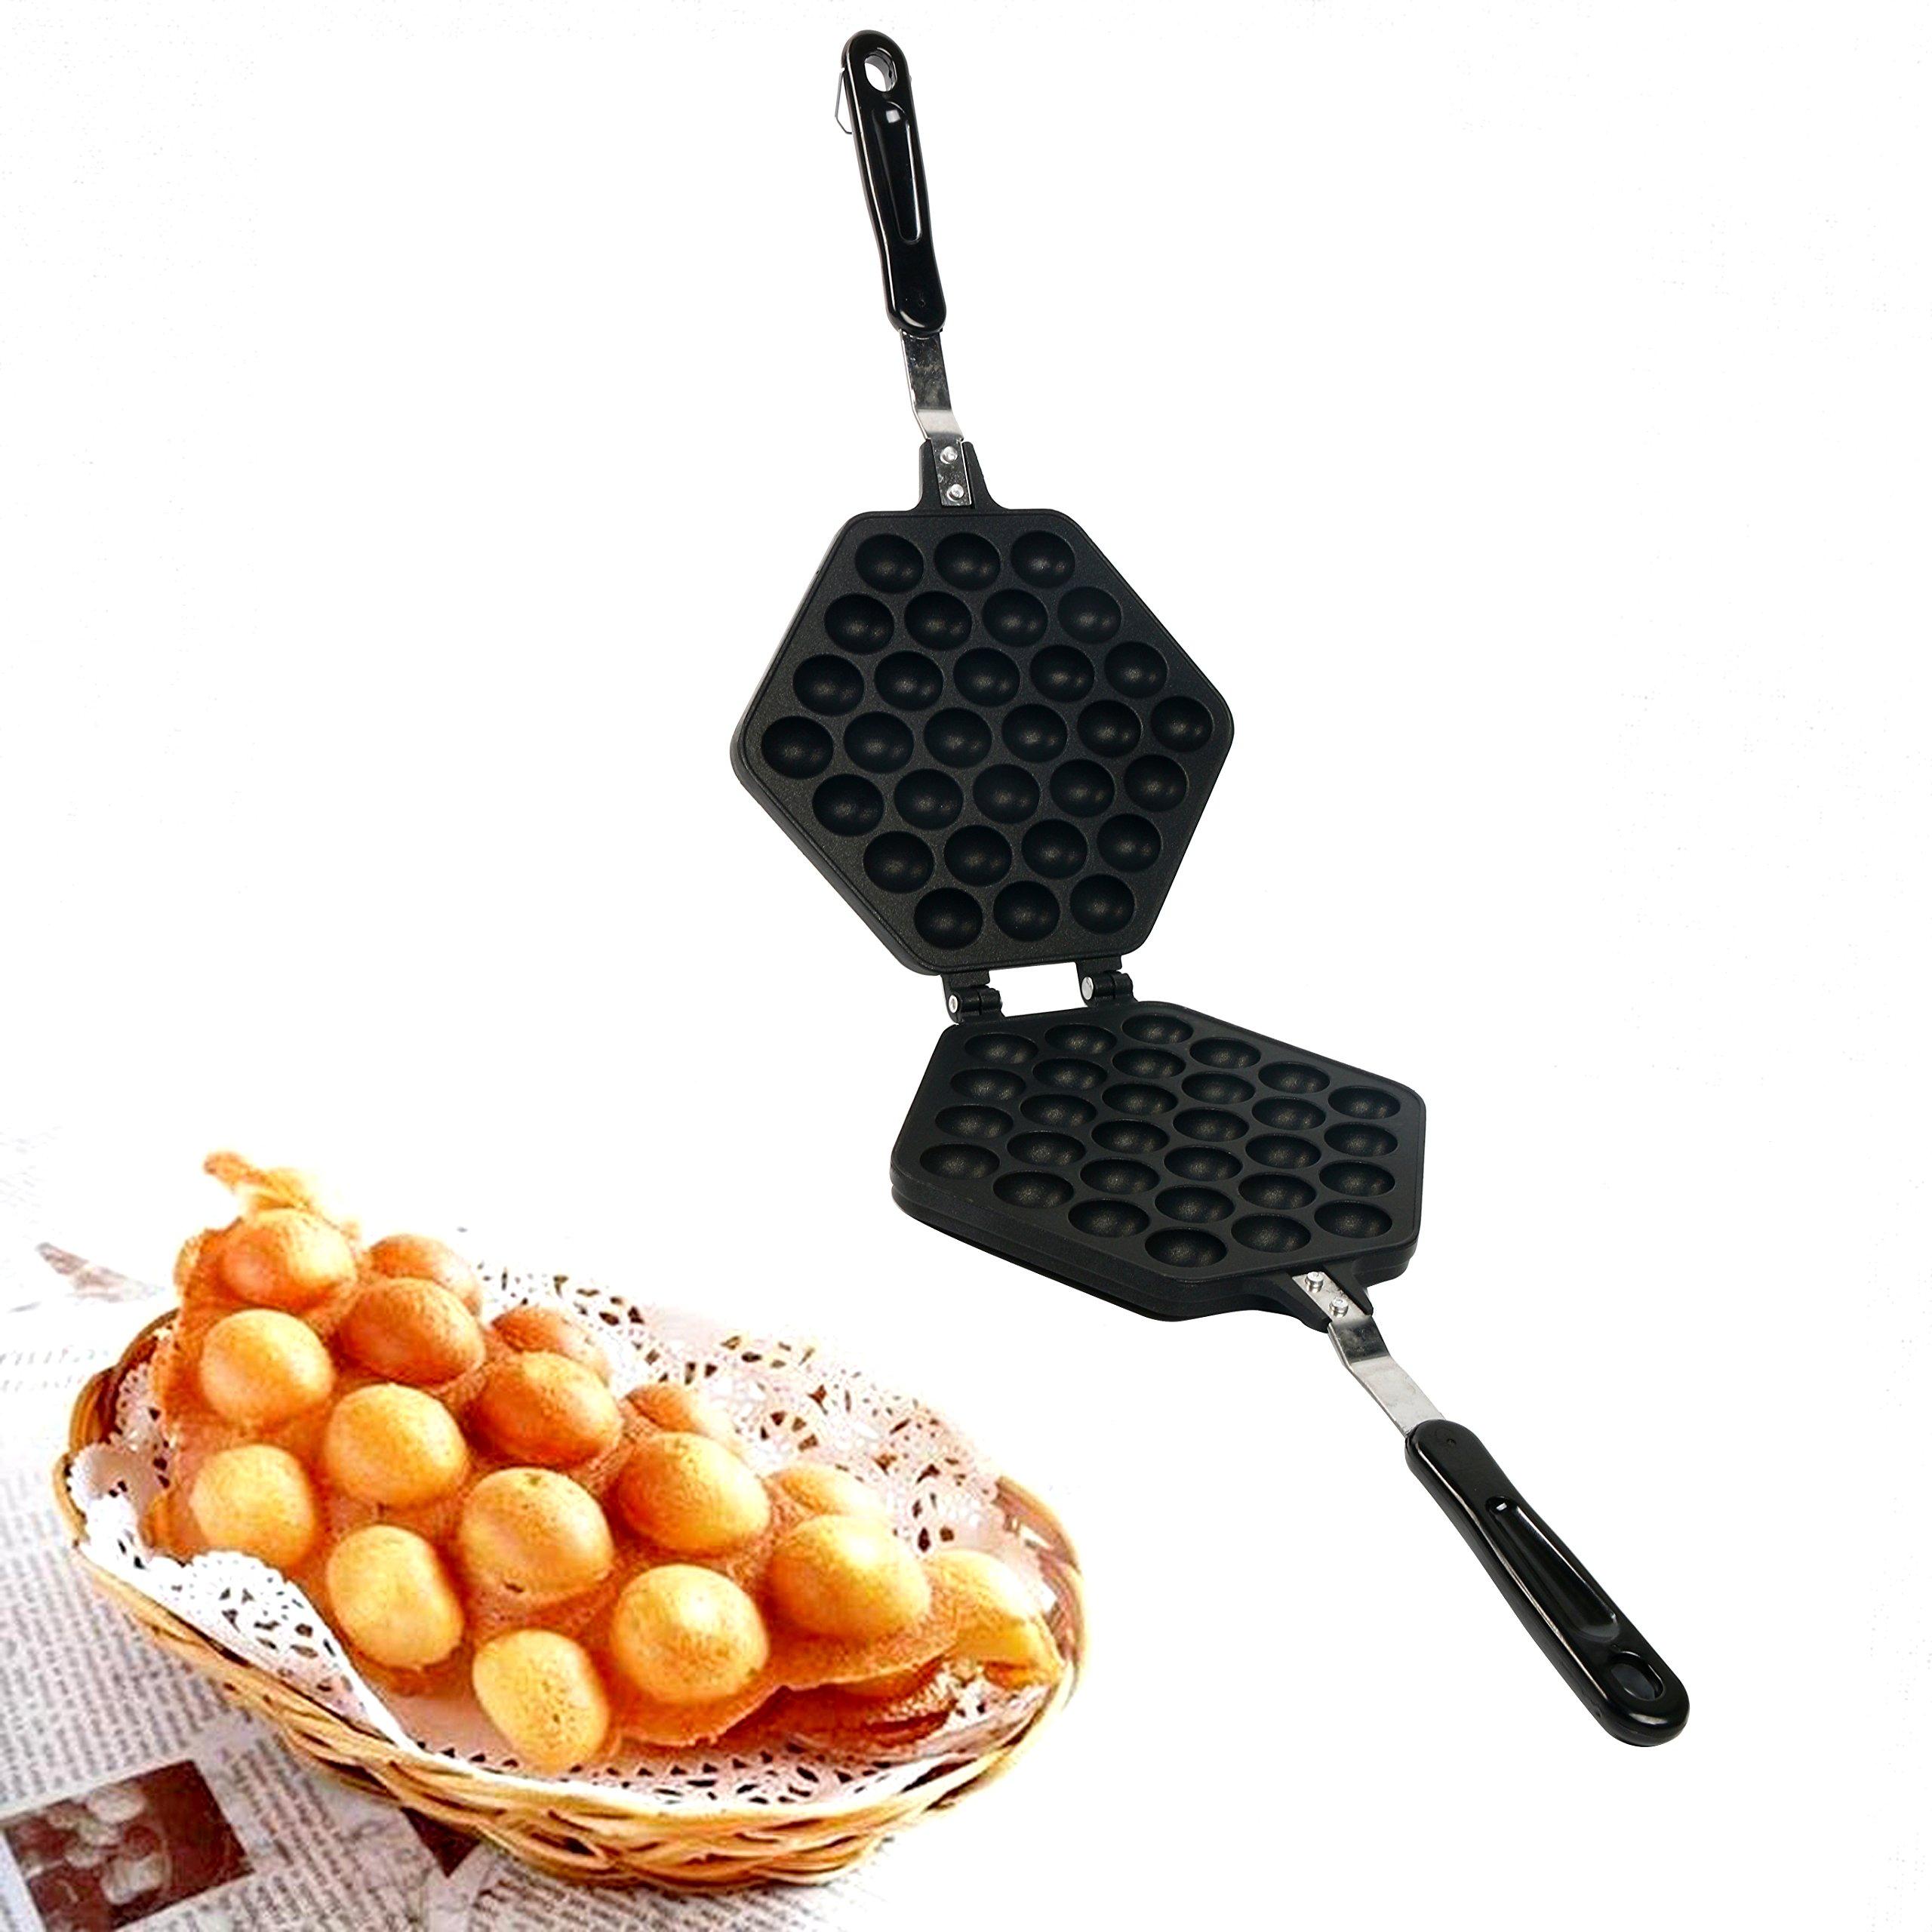 Yaegoo Egg Waffle Pan,Non-Stick Grill Egg Cake Pan Egg Puff Waffle Maker Double Sided Iron Pressure Pan,Black